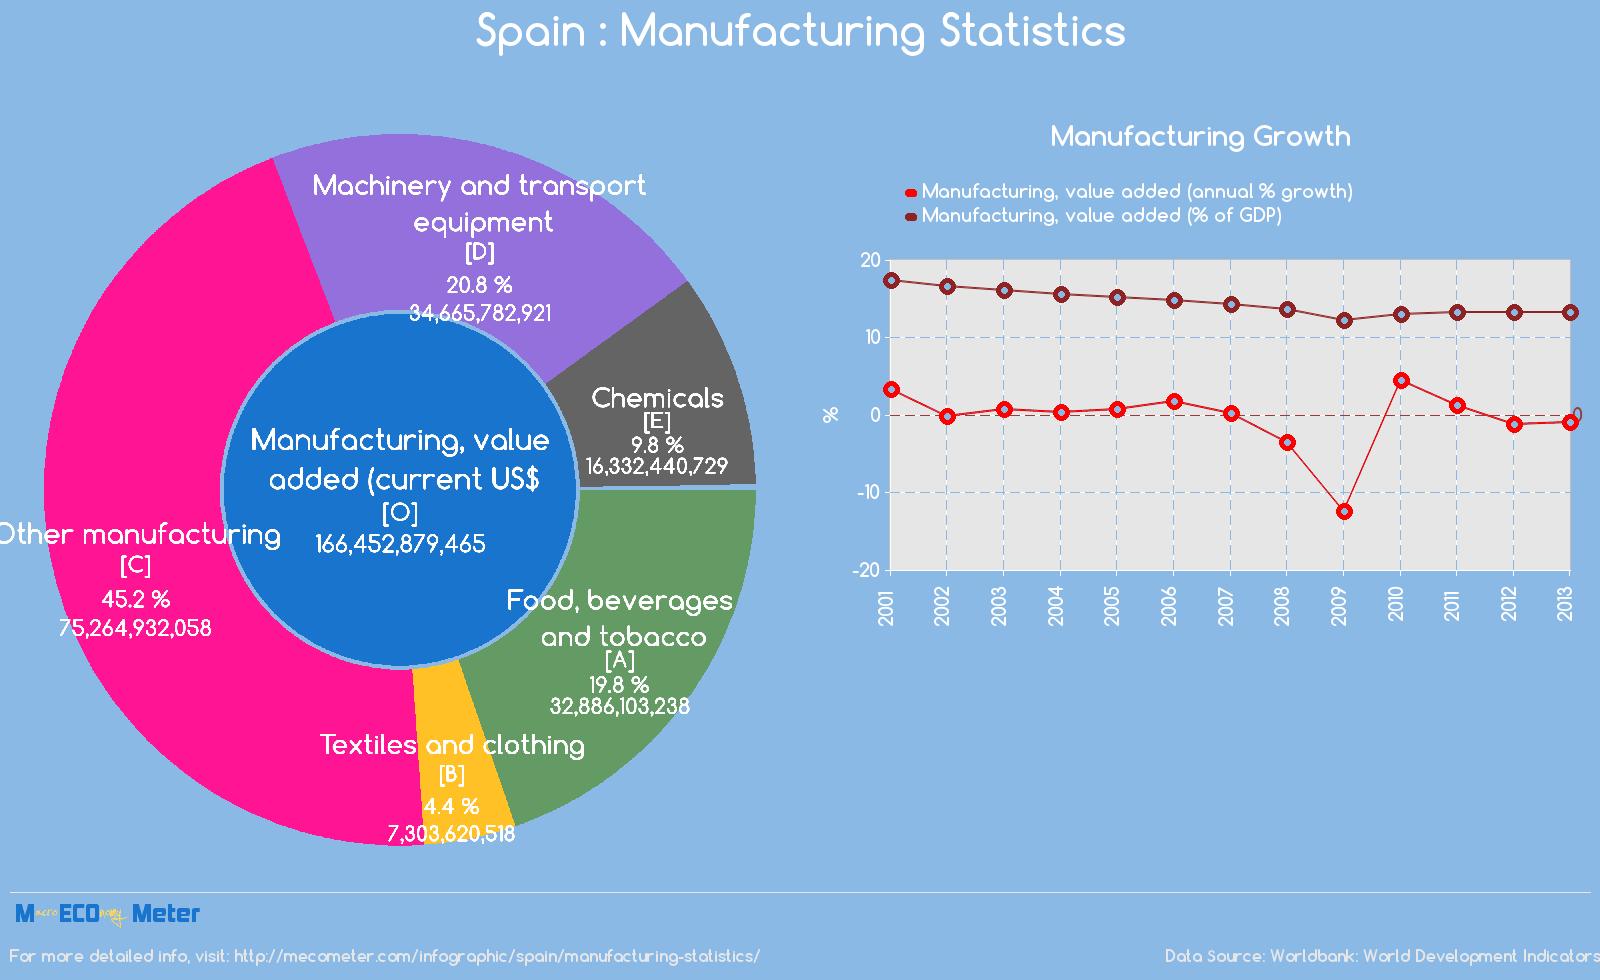 Spain : Manufacturing Statistics